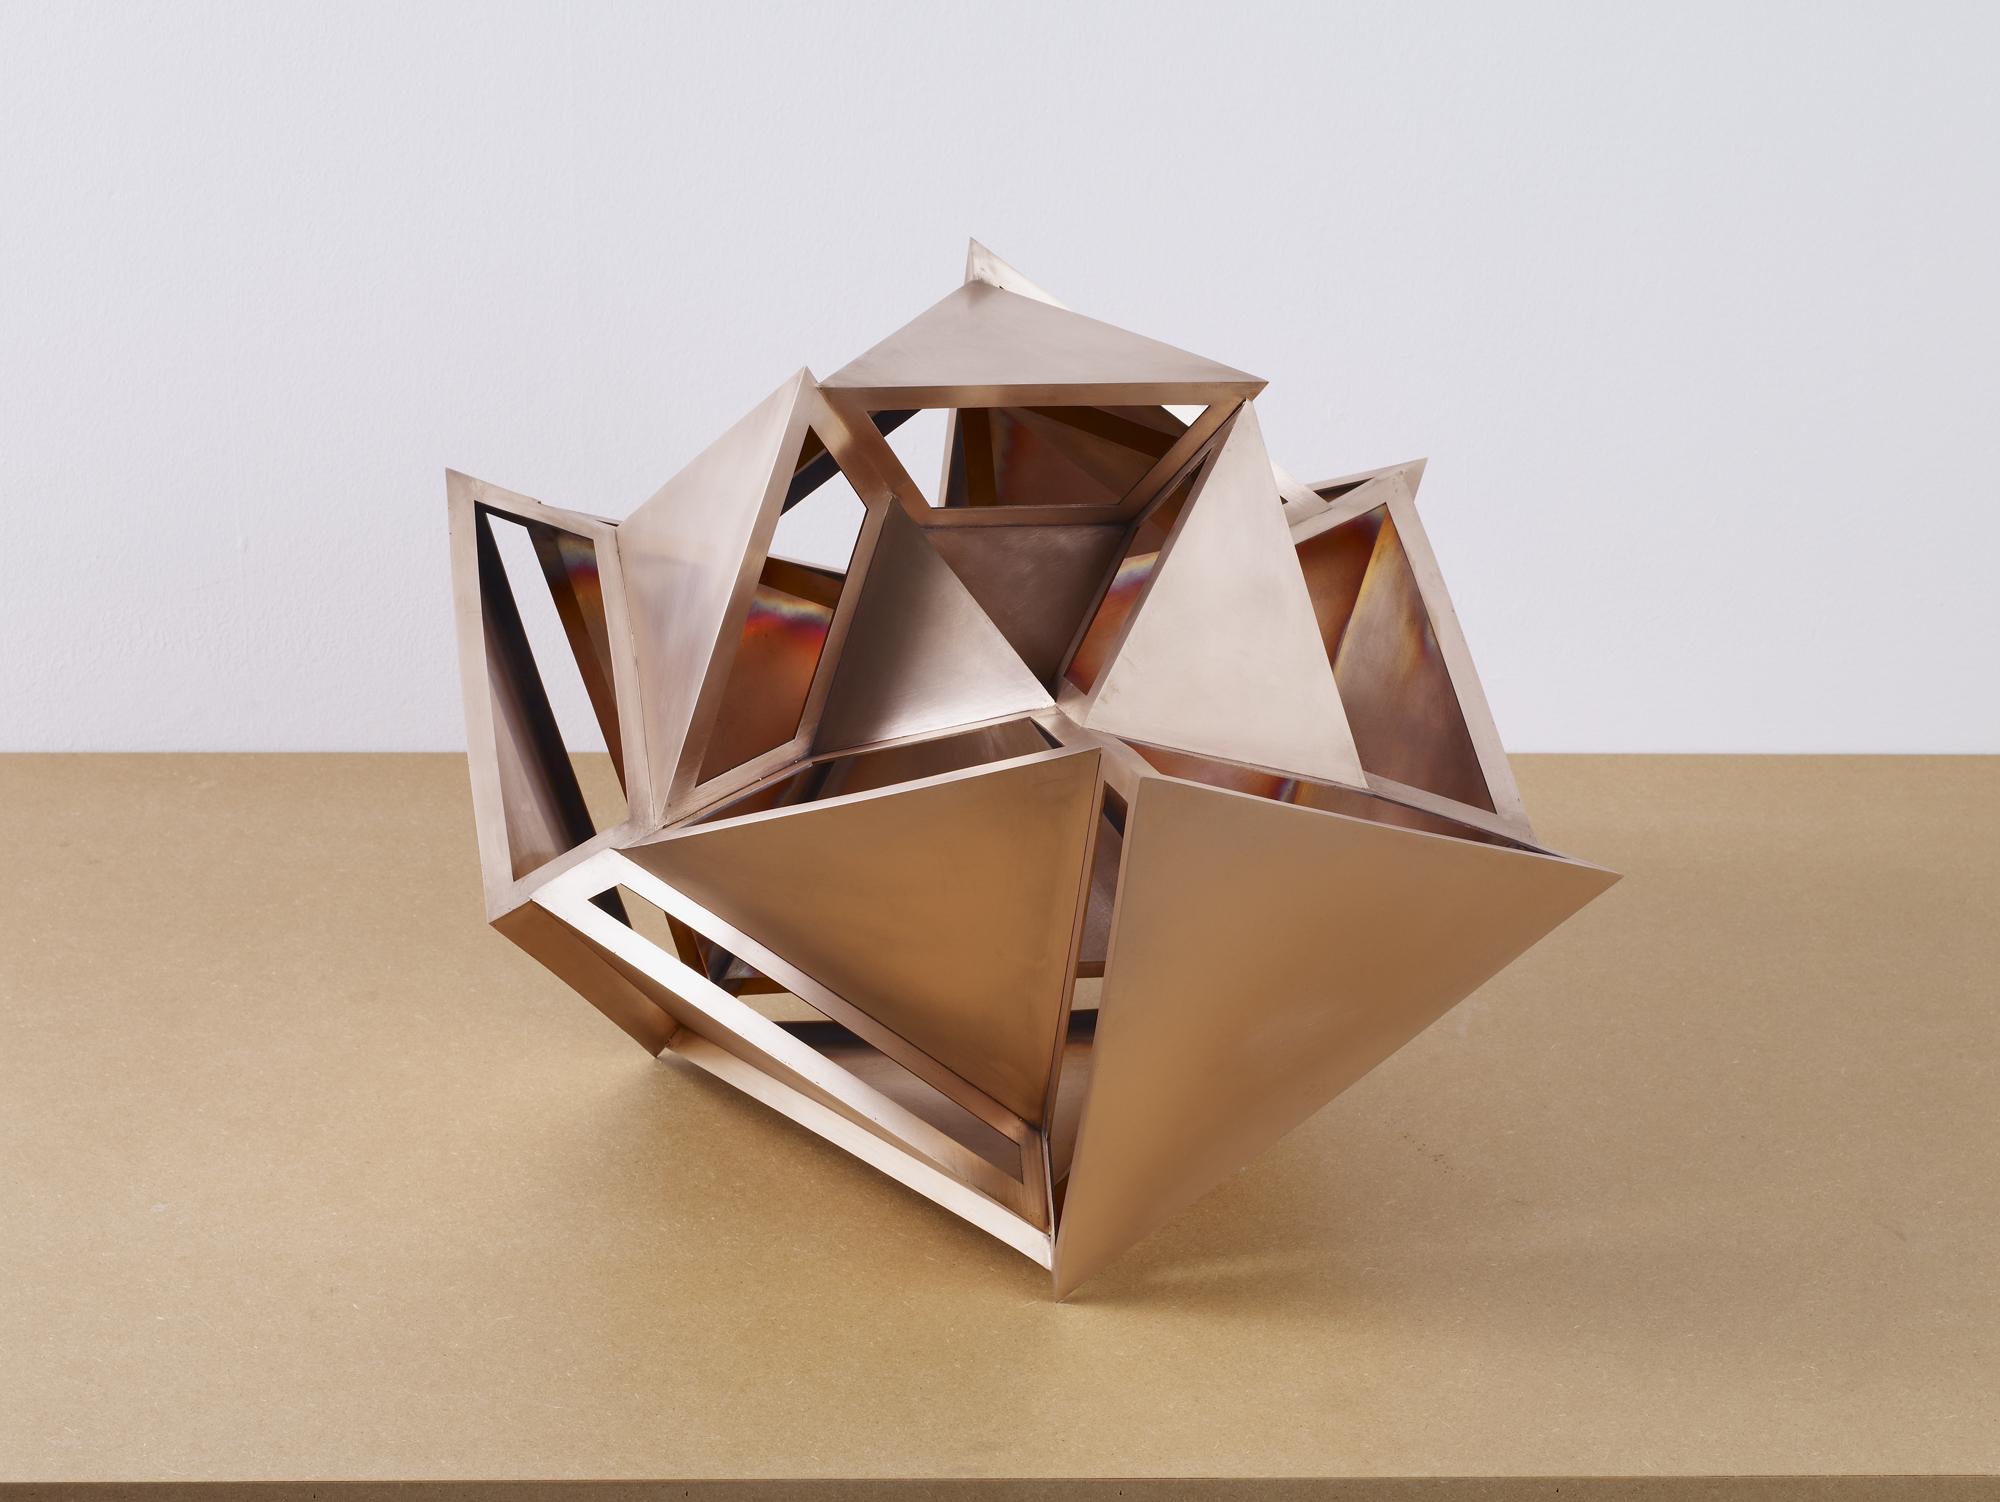 CS241_Perimeter Studies (Icosahedron) No.3 of Set 1_2011